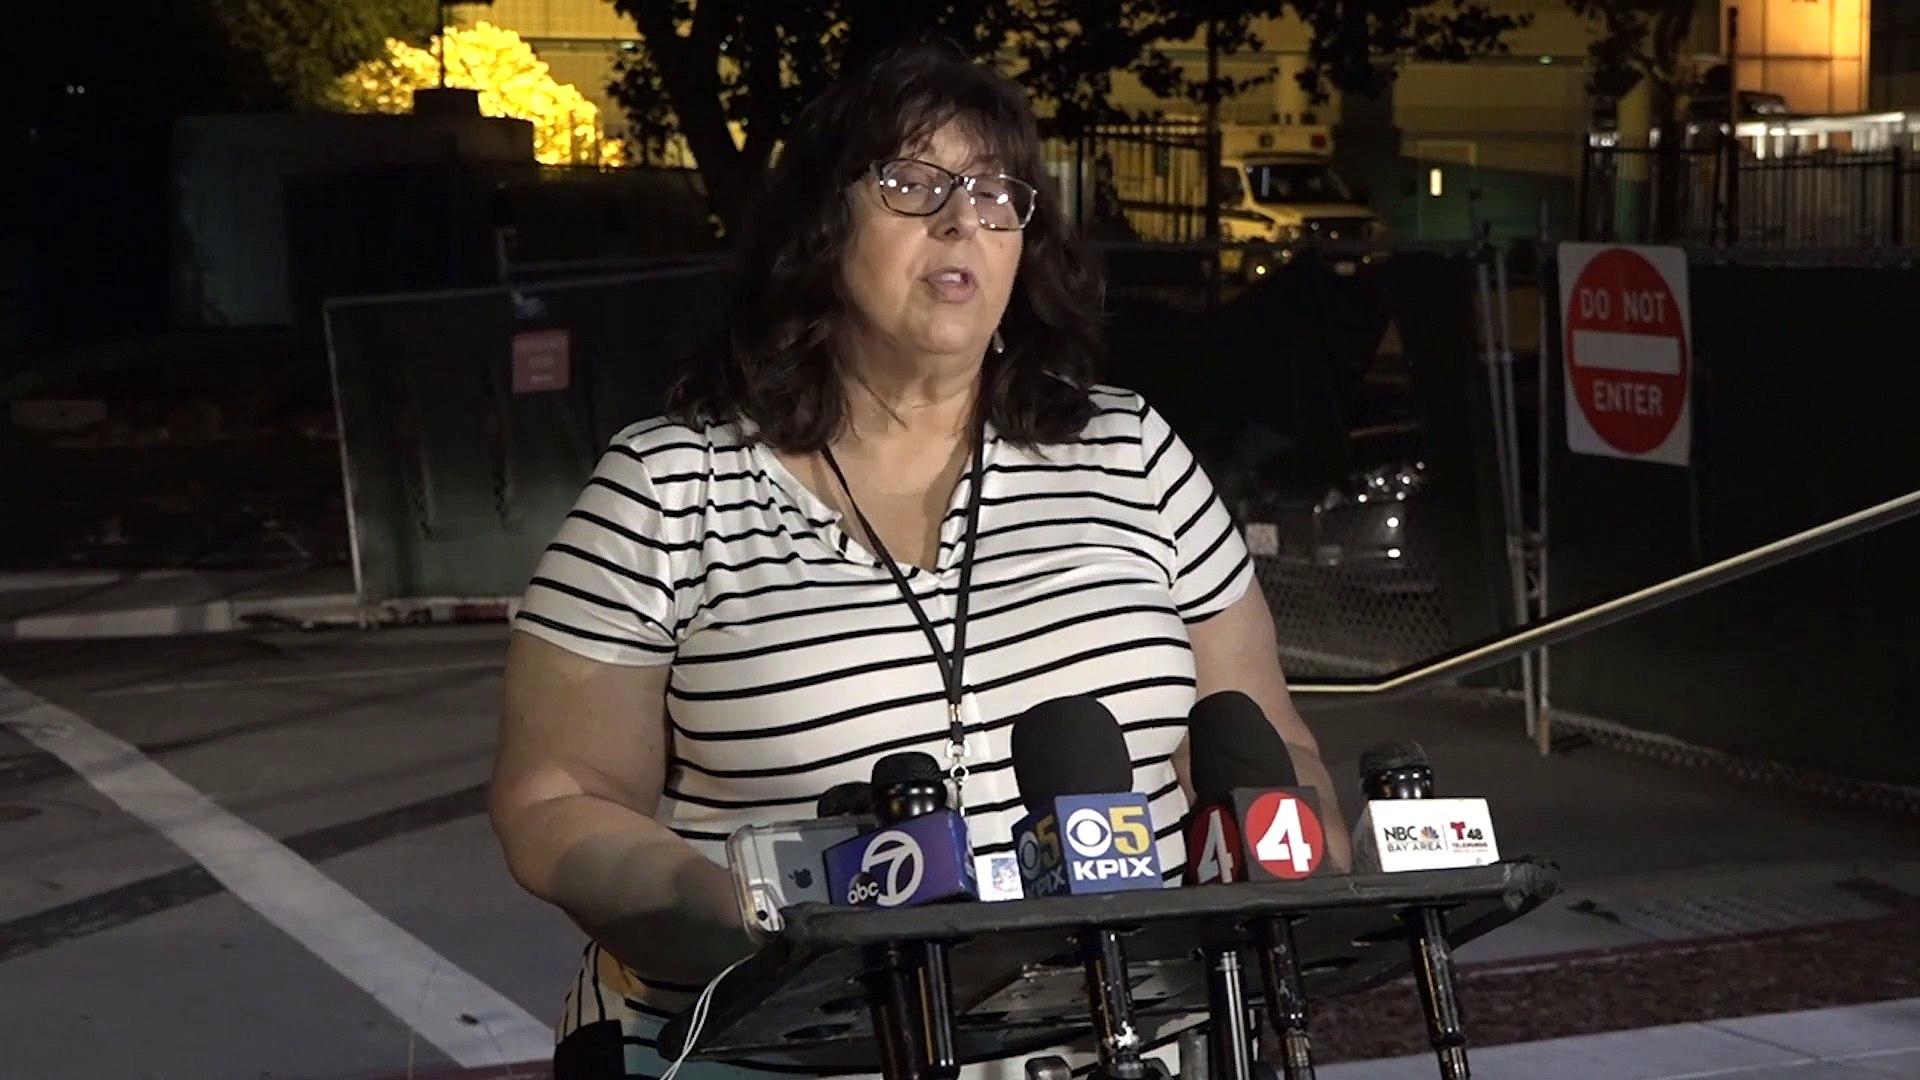 Gilroy Garlic Festival shooting- Victims update at Santa Clara Valley Health System